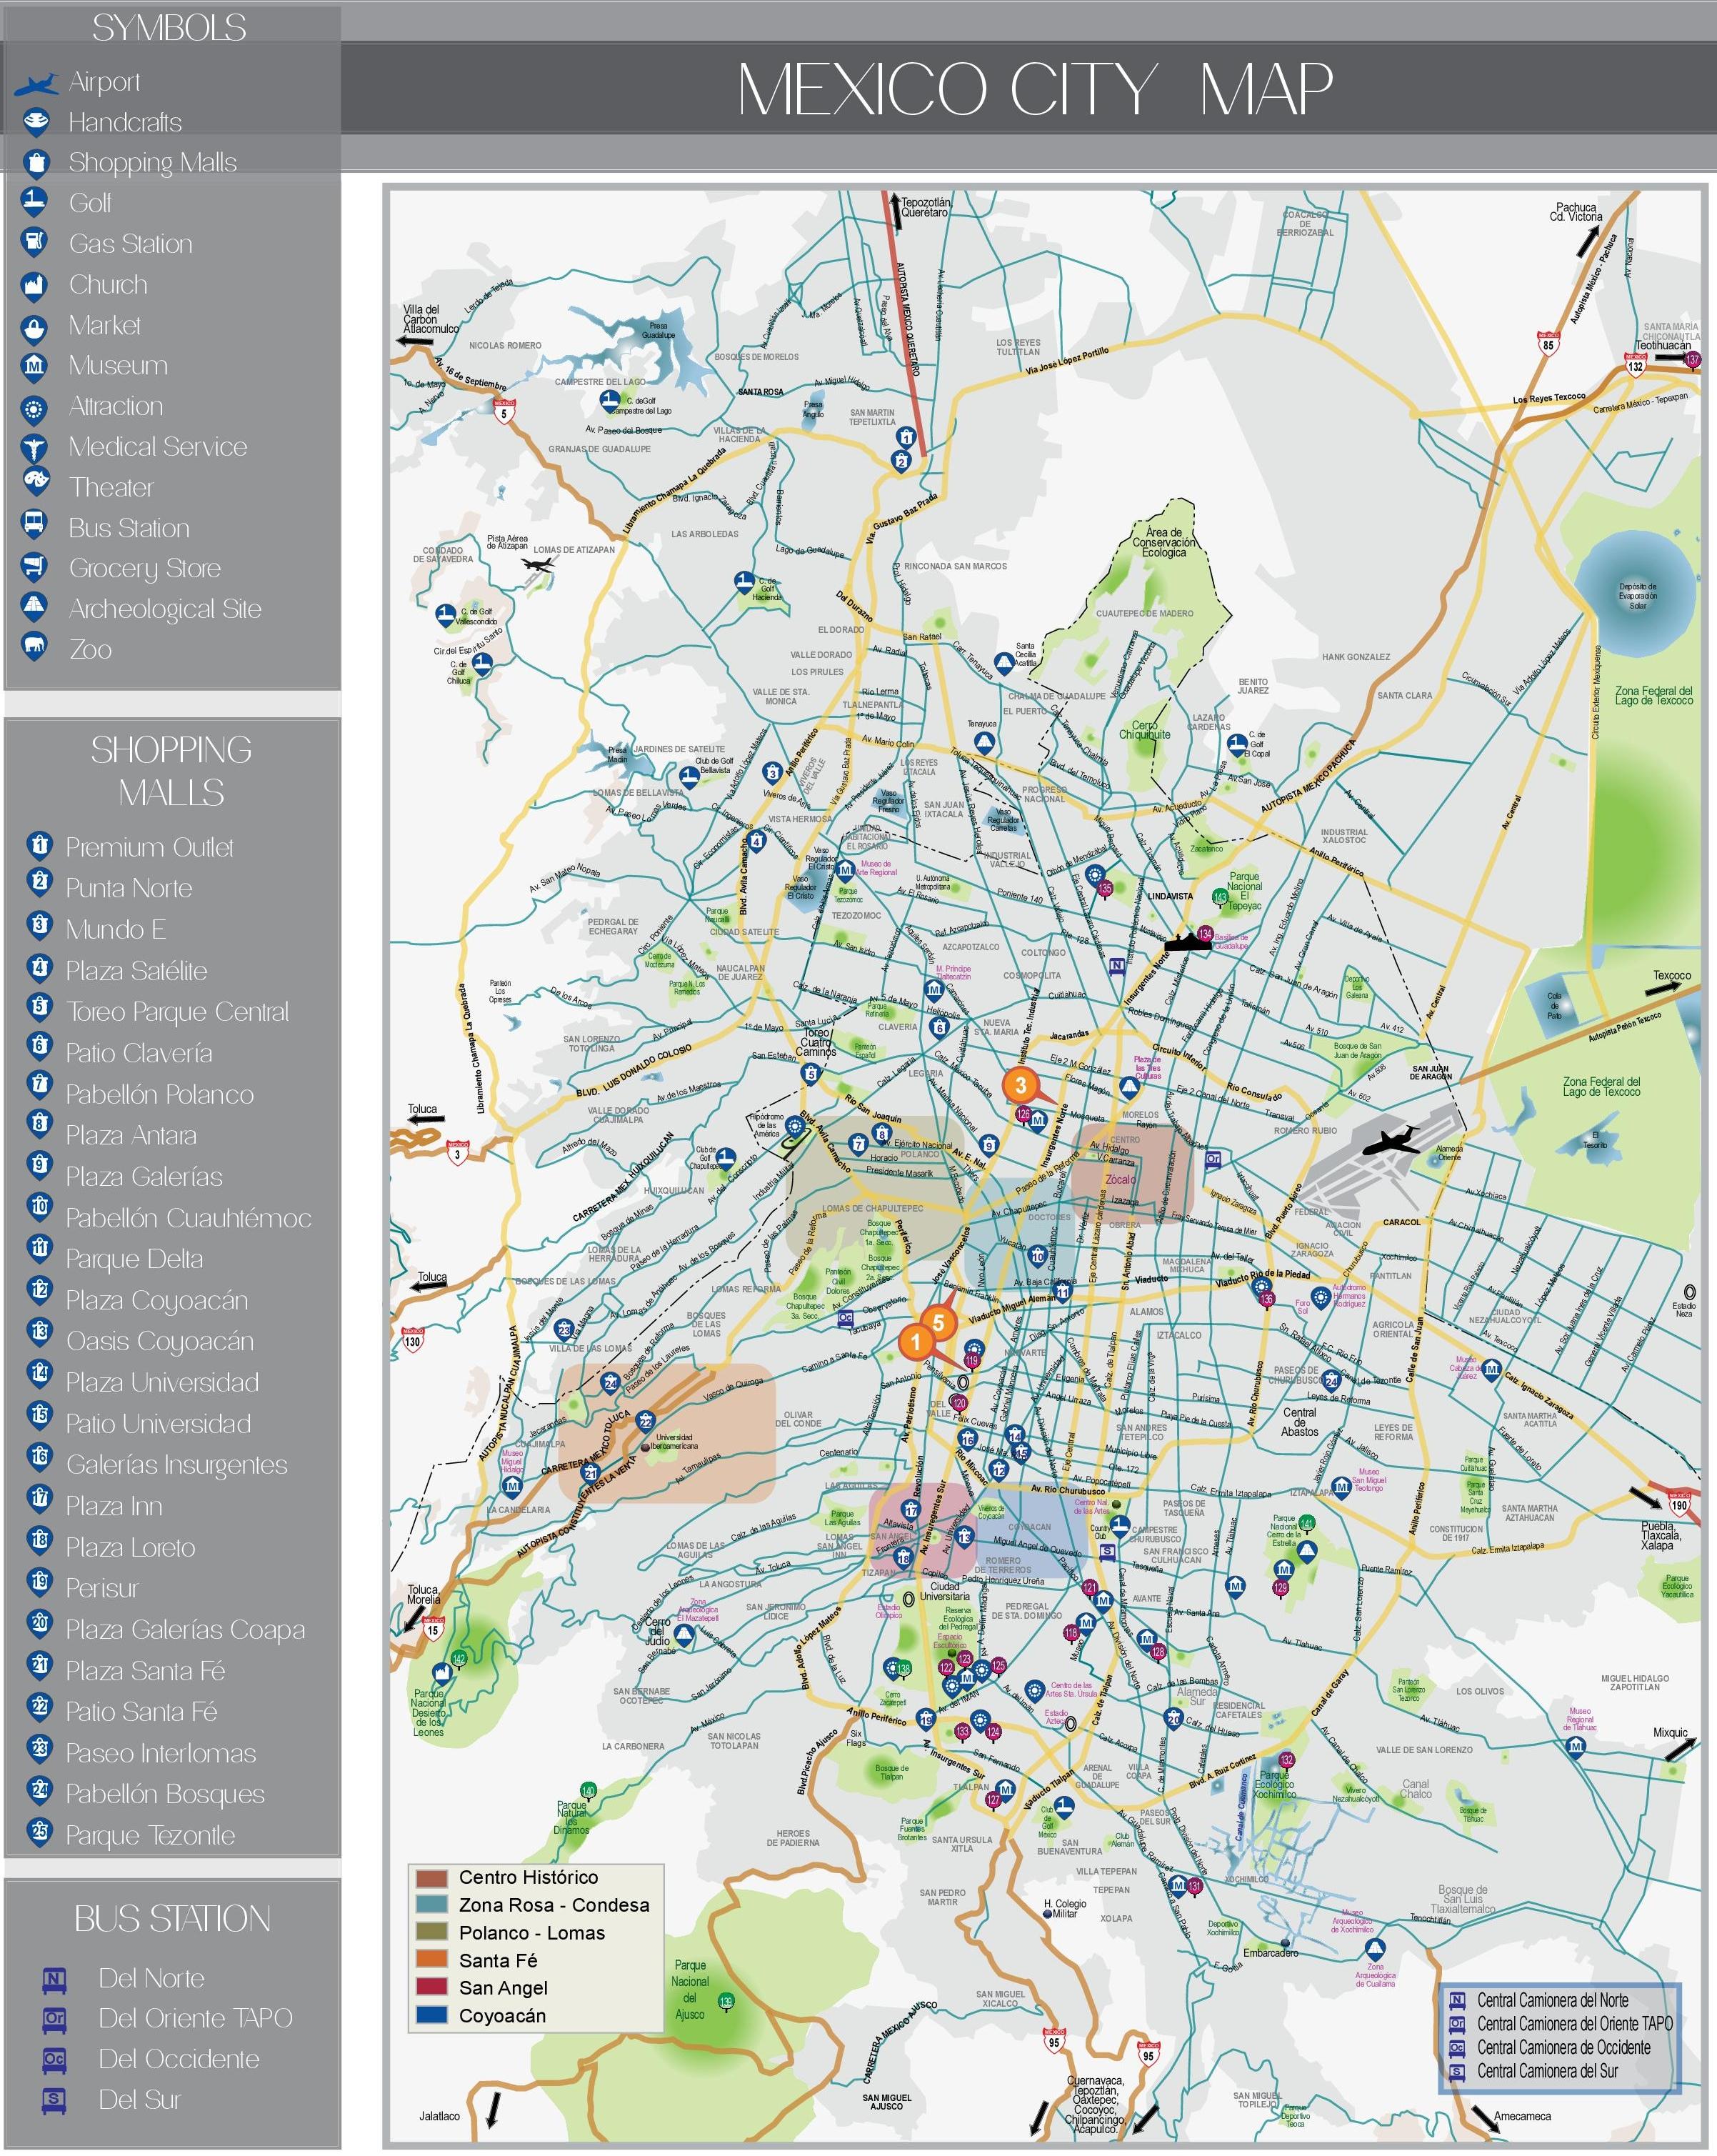 Mexico City Maps | Mexico | Maps Of City Of Mexico - Printable Map Of Mexico City